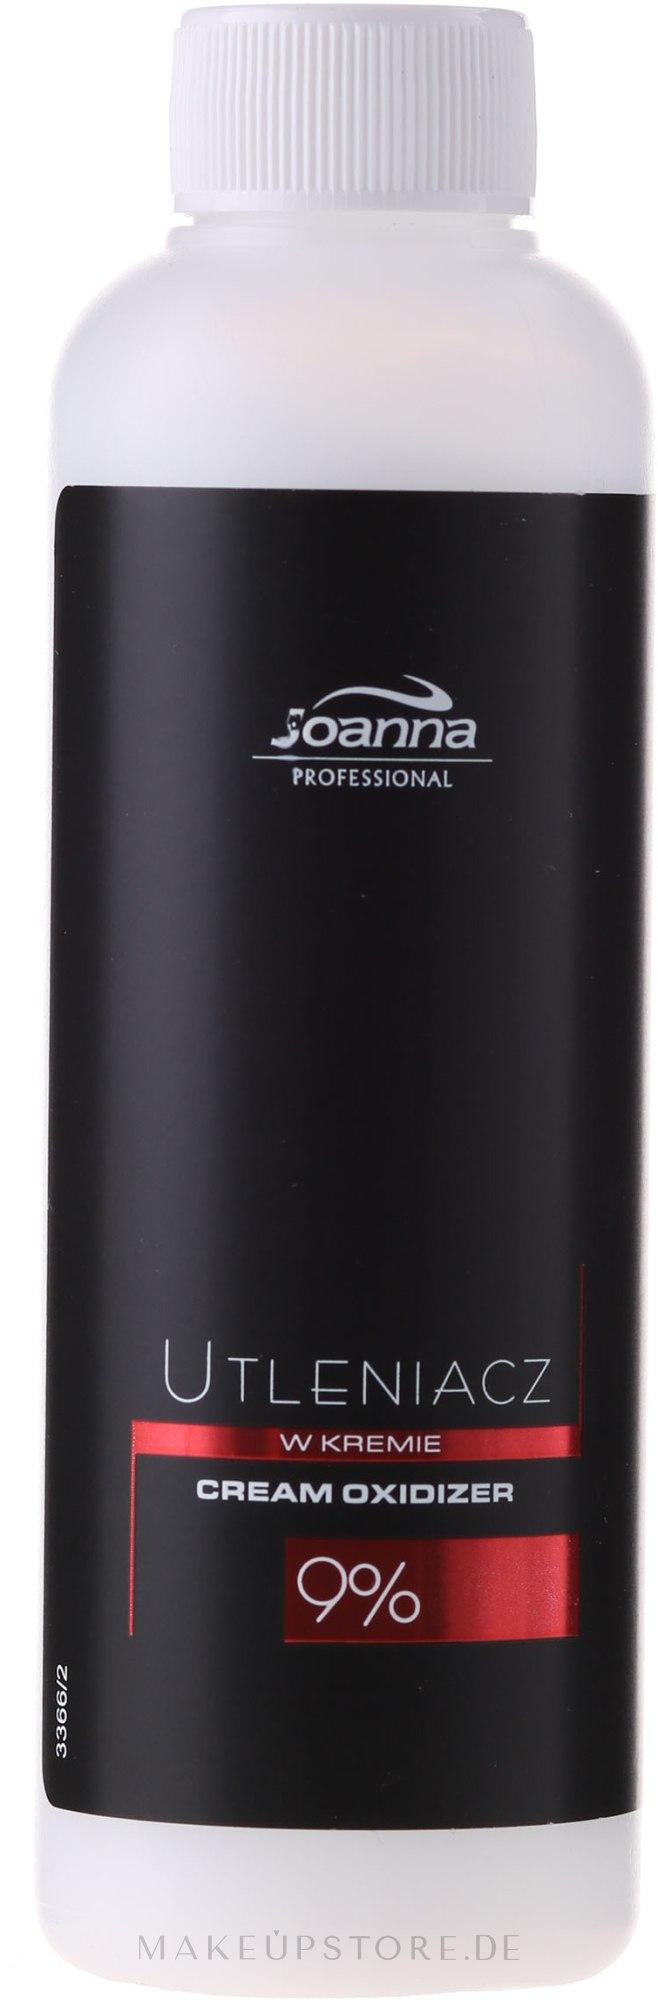 Creme-Oxidationsmittel 9% - Joanna Professional Cream Oxidizer 9% — Bild 130 ml